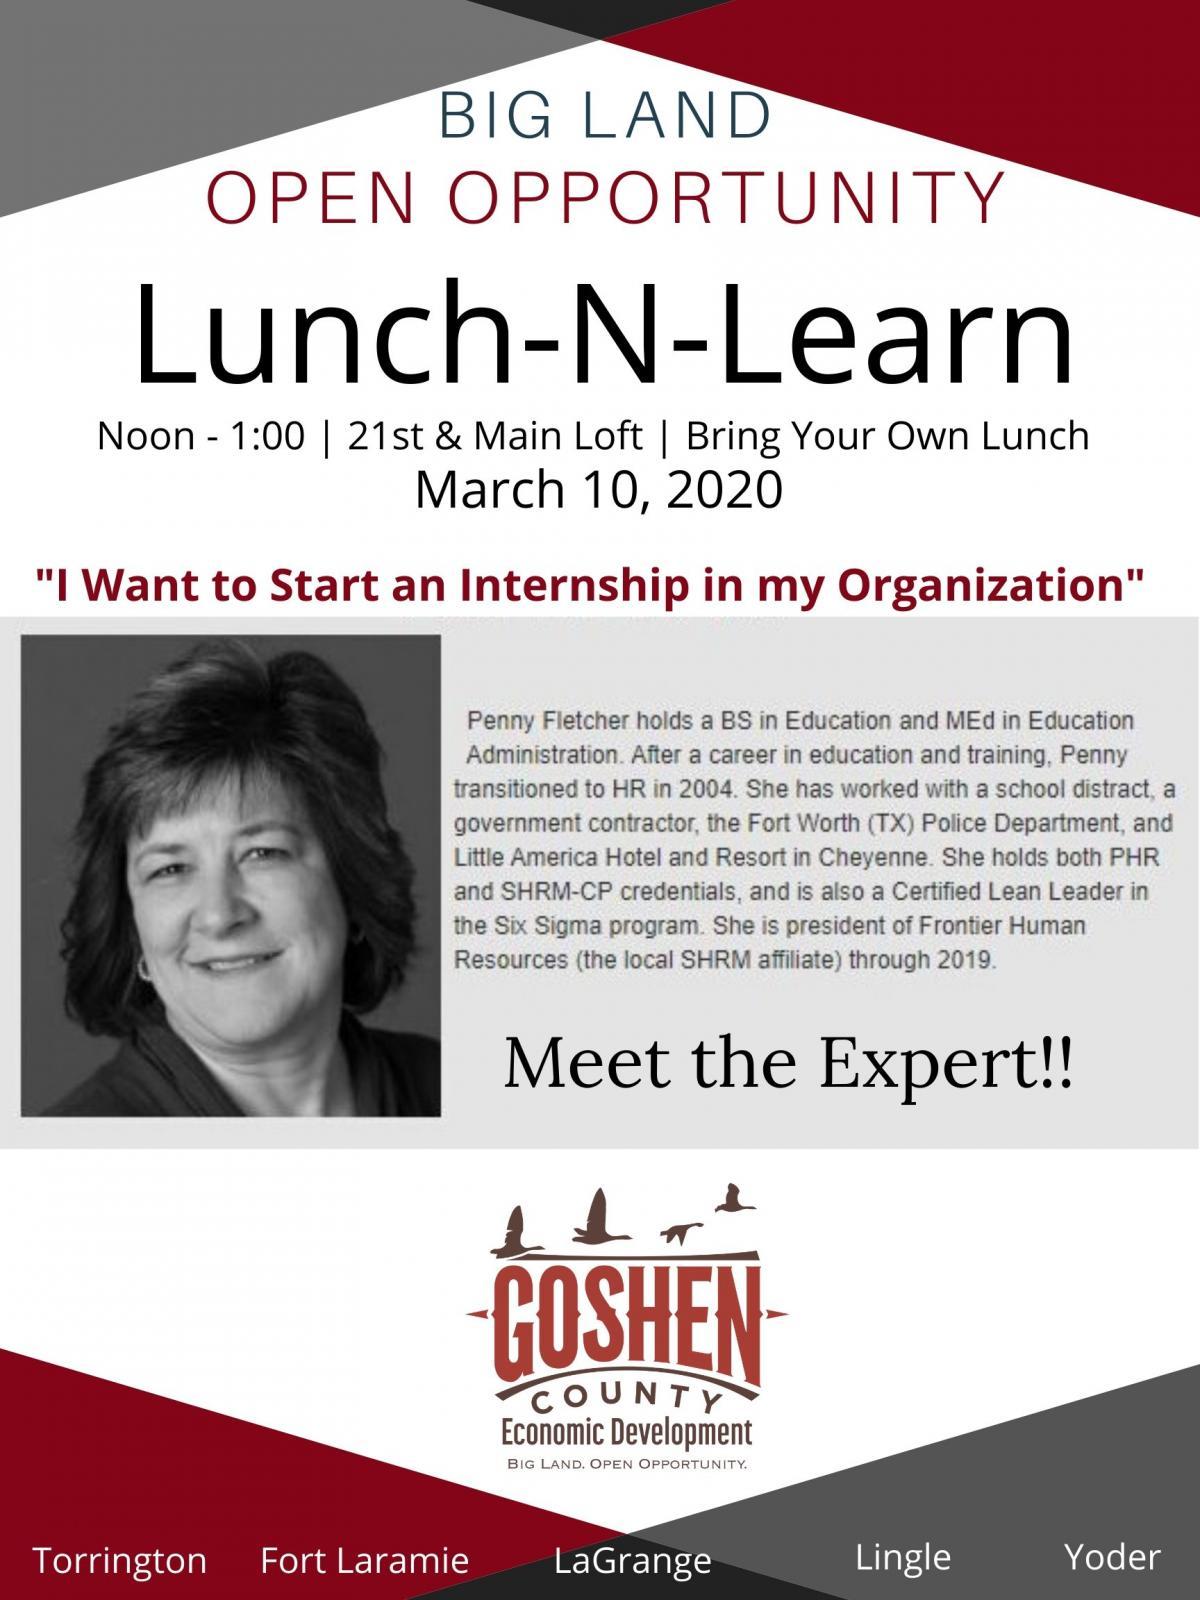 Lunch-N-Learn Internships Photo